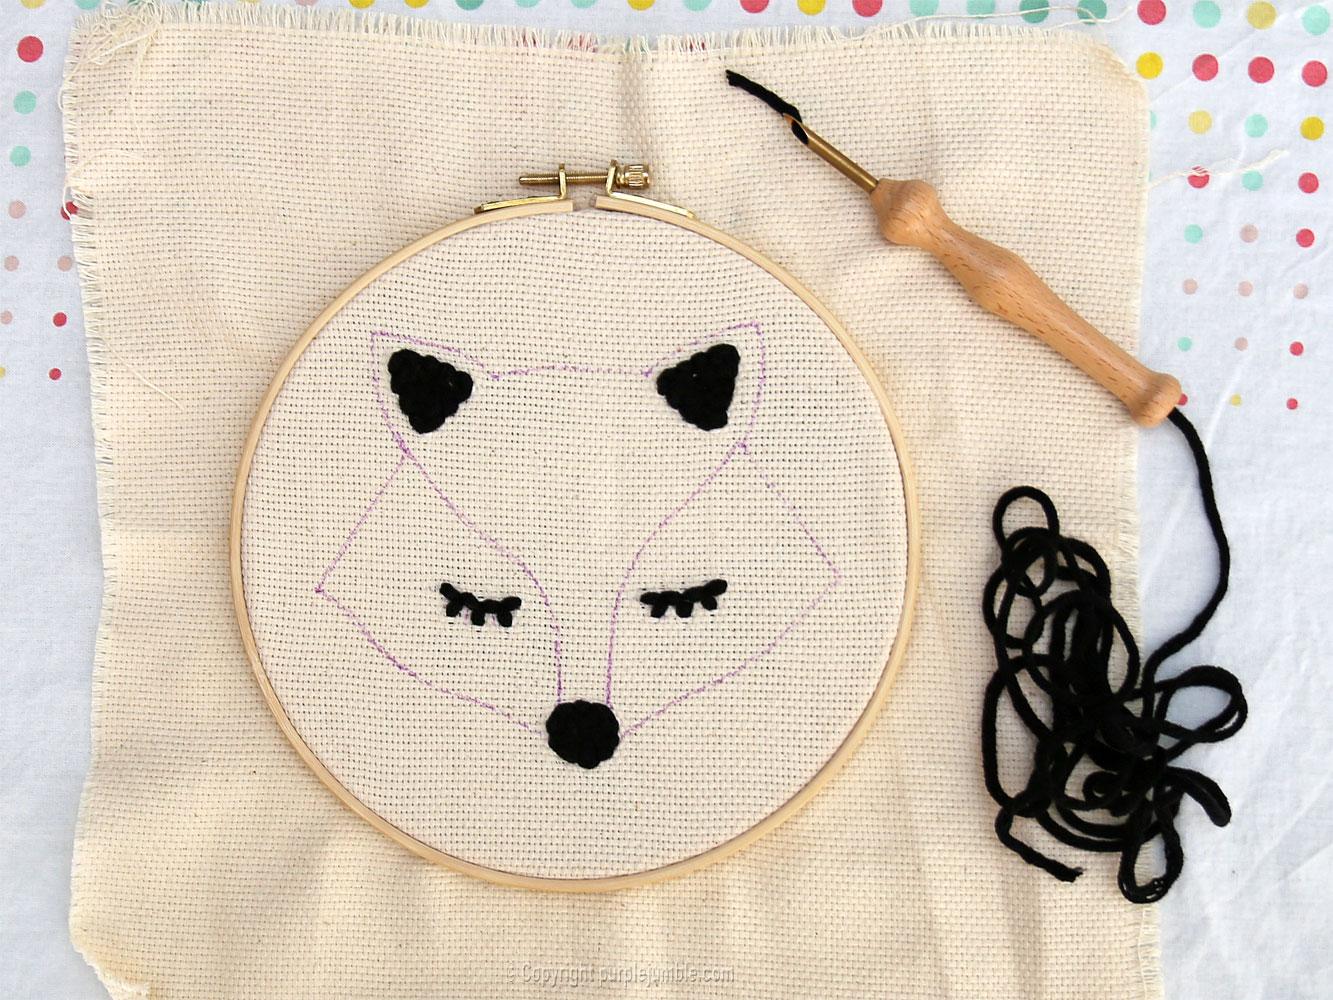 diy cadre-renard-punch needle graine créative dessin